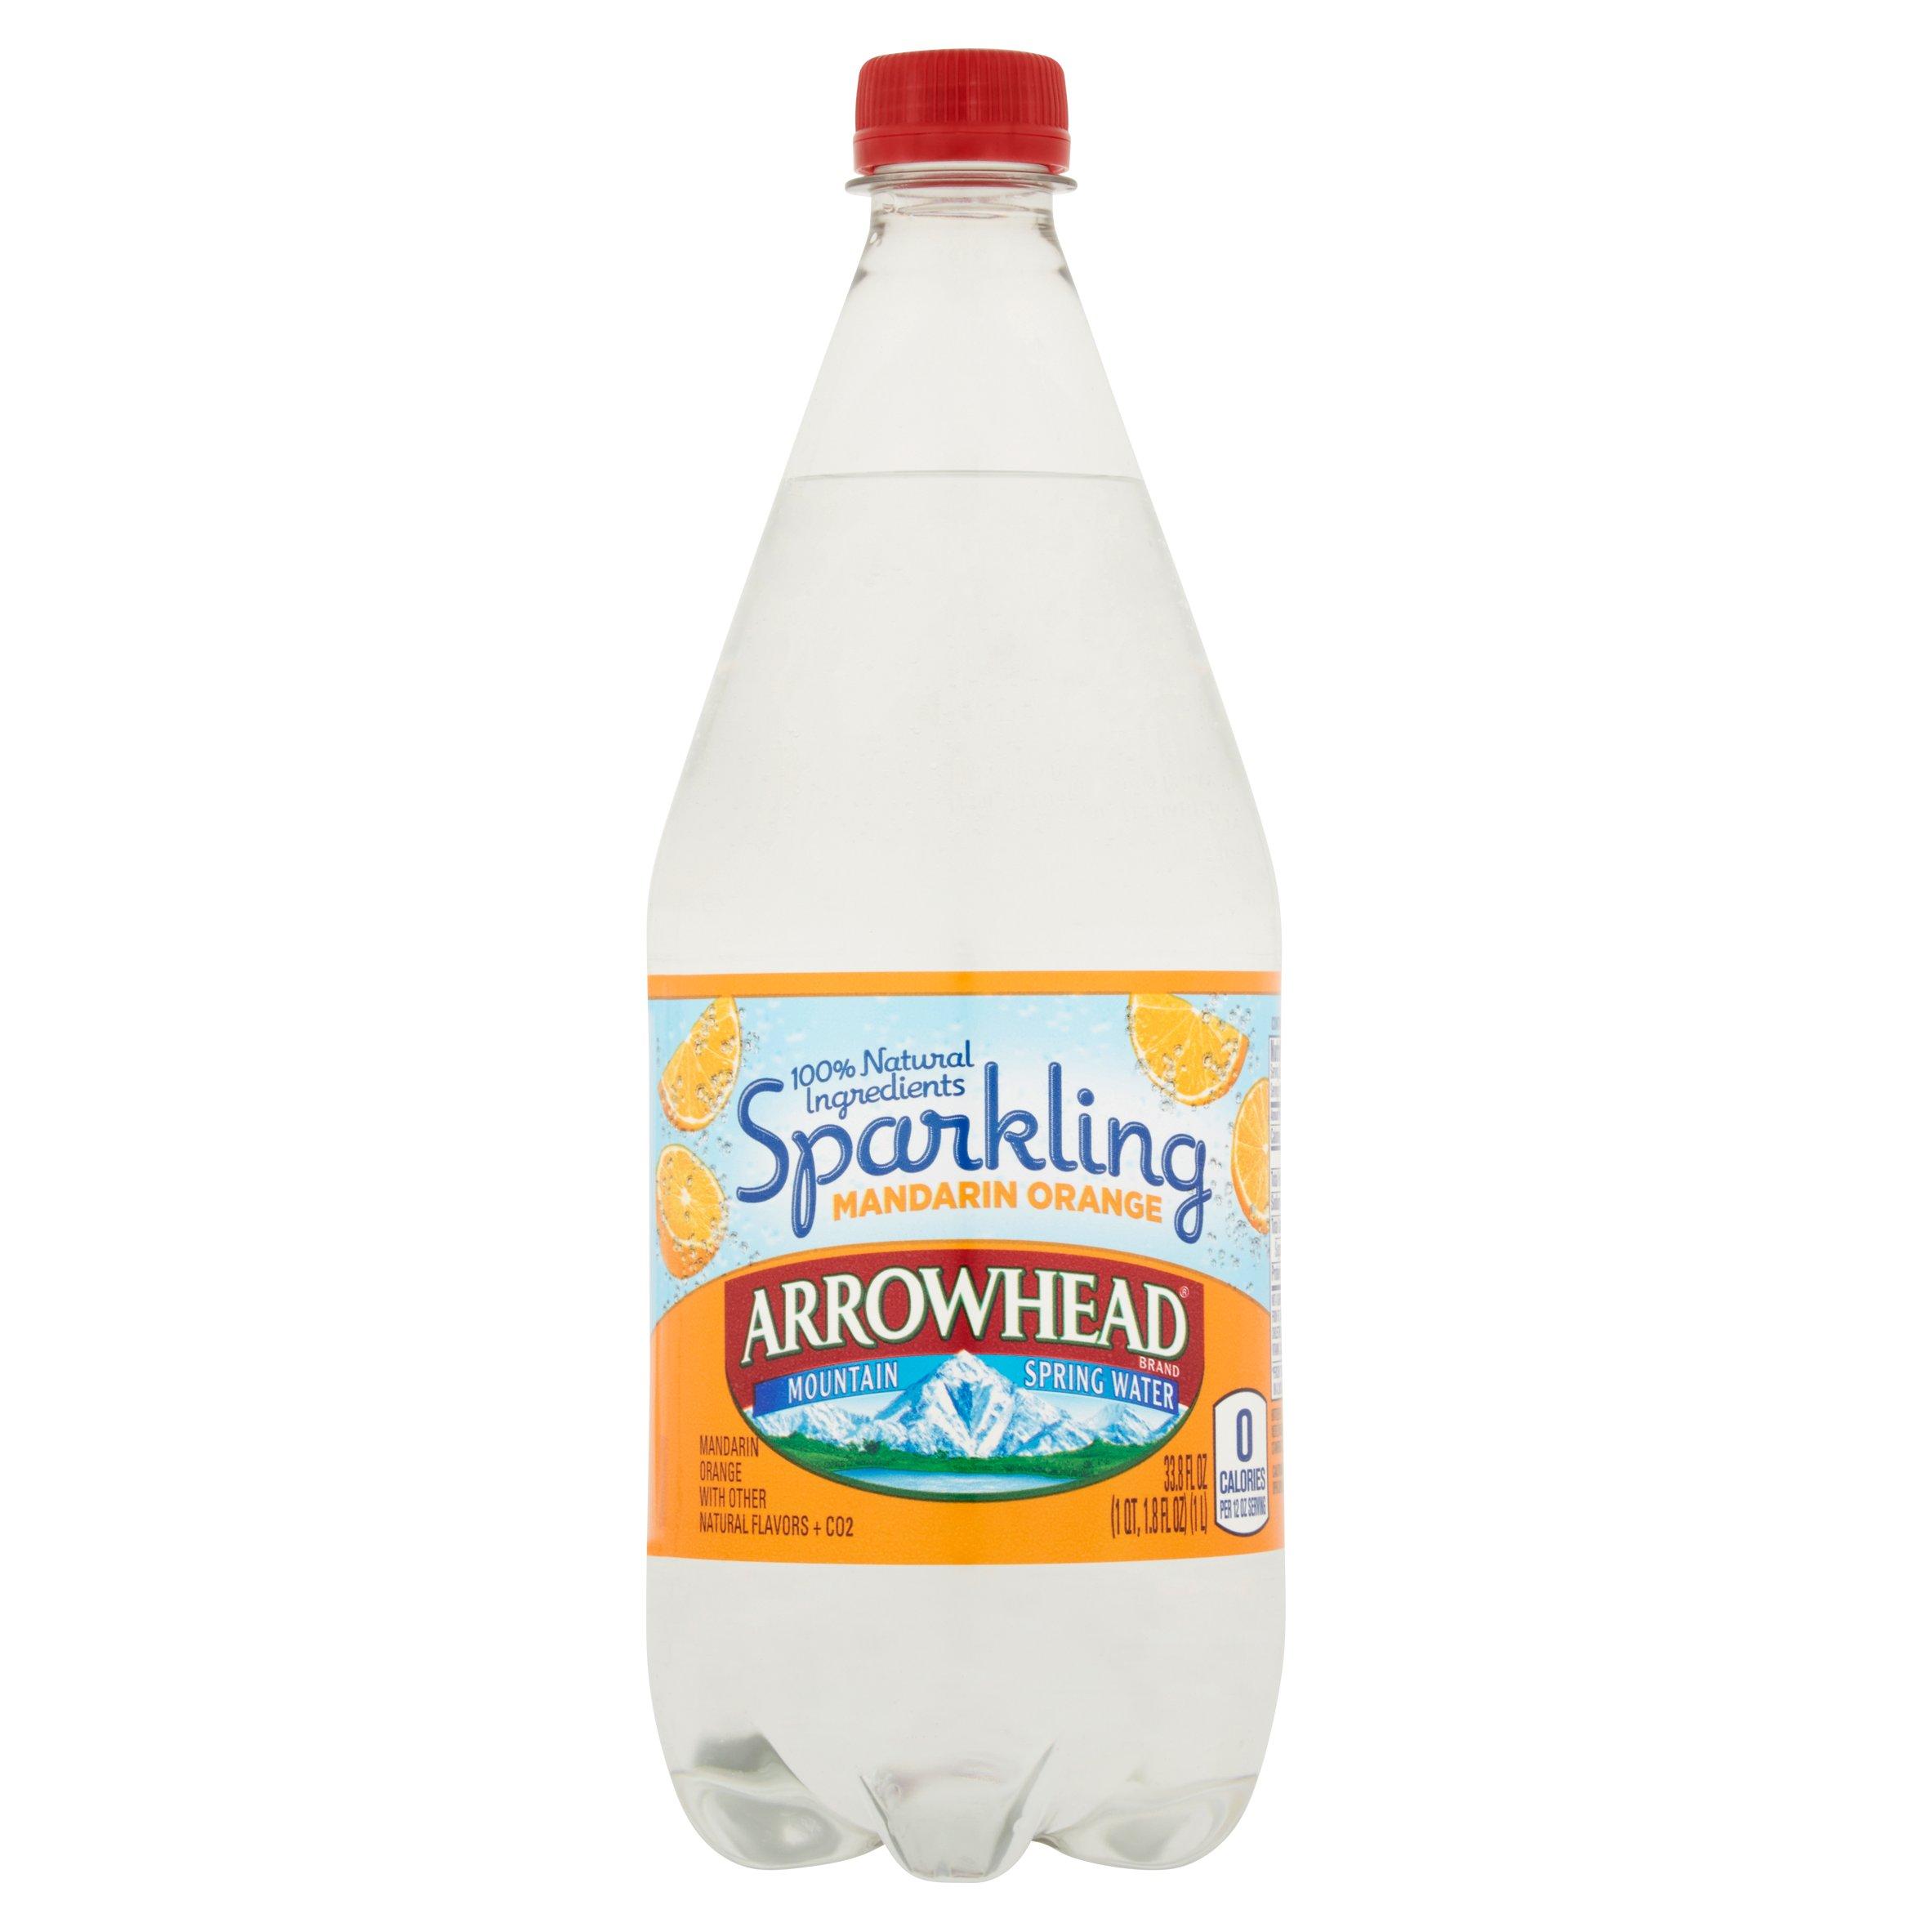 ArrowHead Sparkling Mandarin Orange Mountain Spring Water 33.8fl oz